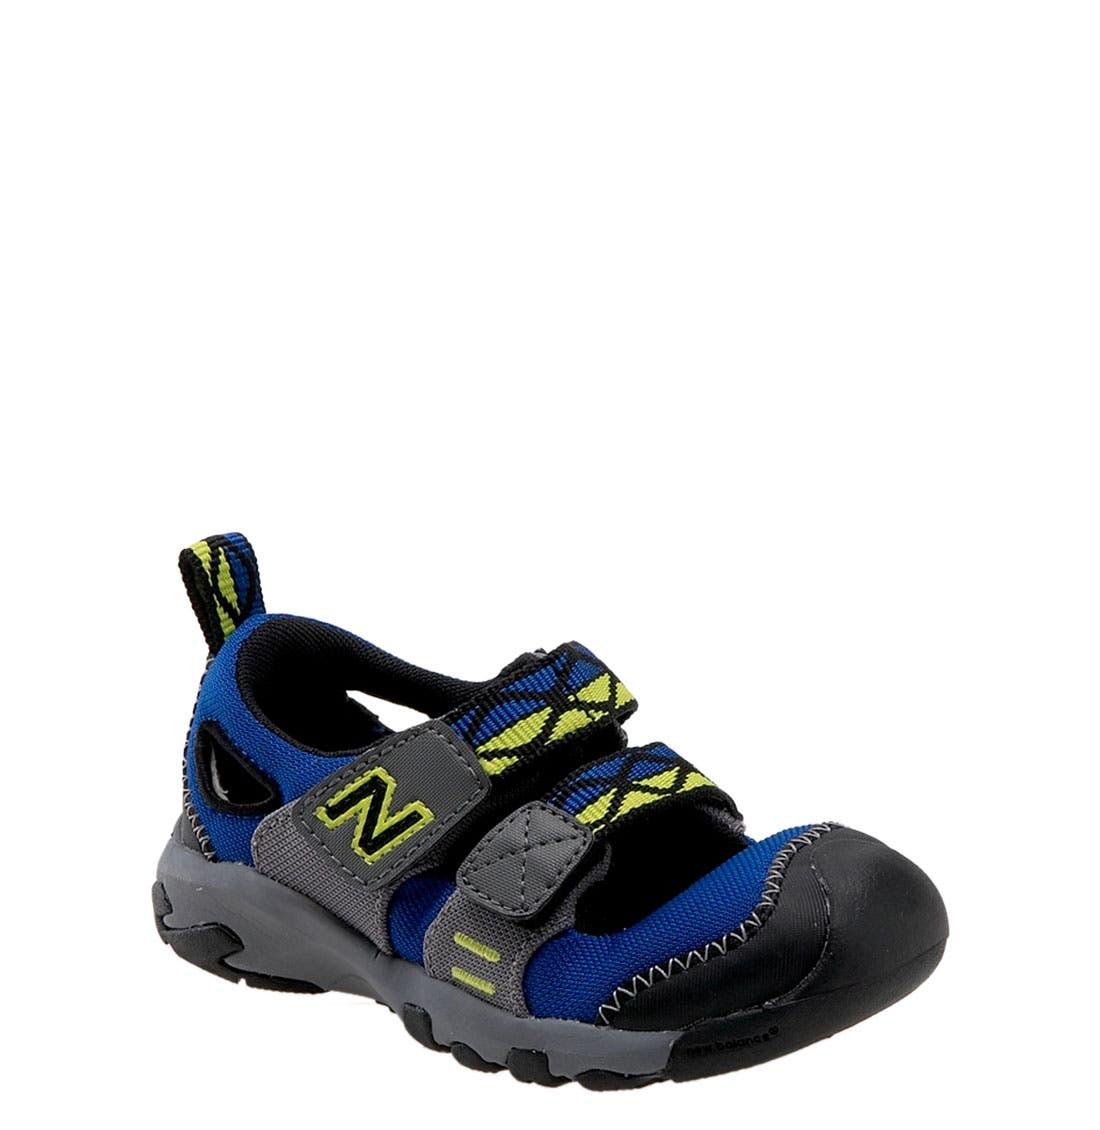 '553' Water Sandal,                             Main thumbnail 1, color,                             400